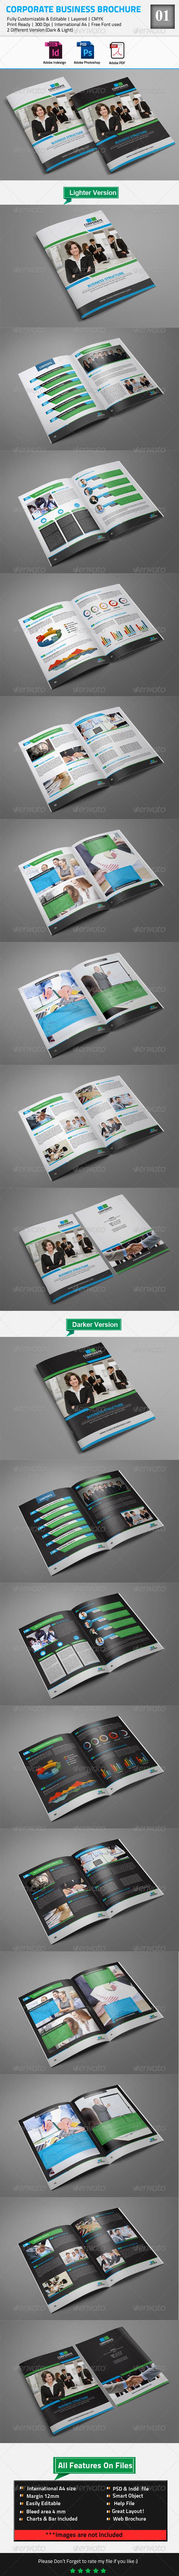 GraphicRiver Corporate Business Brochure 01 8759544